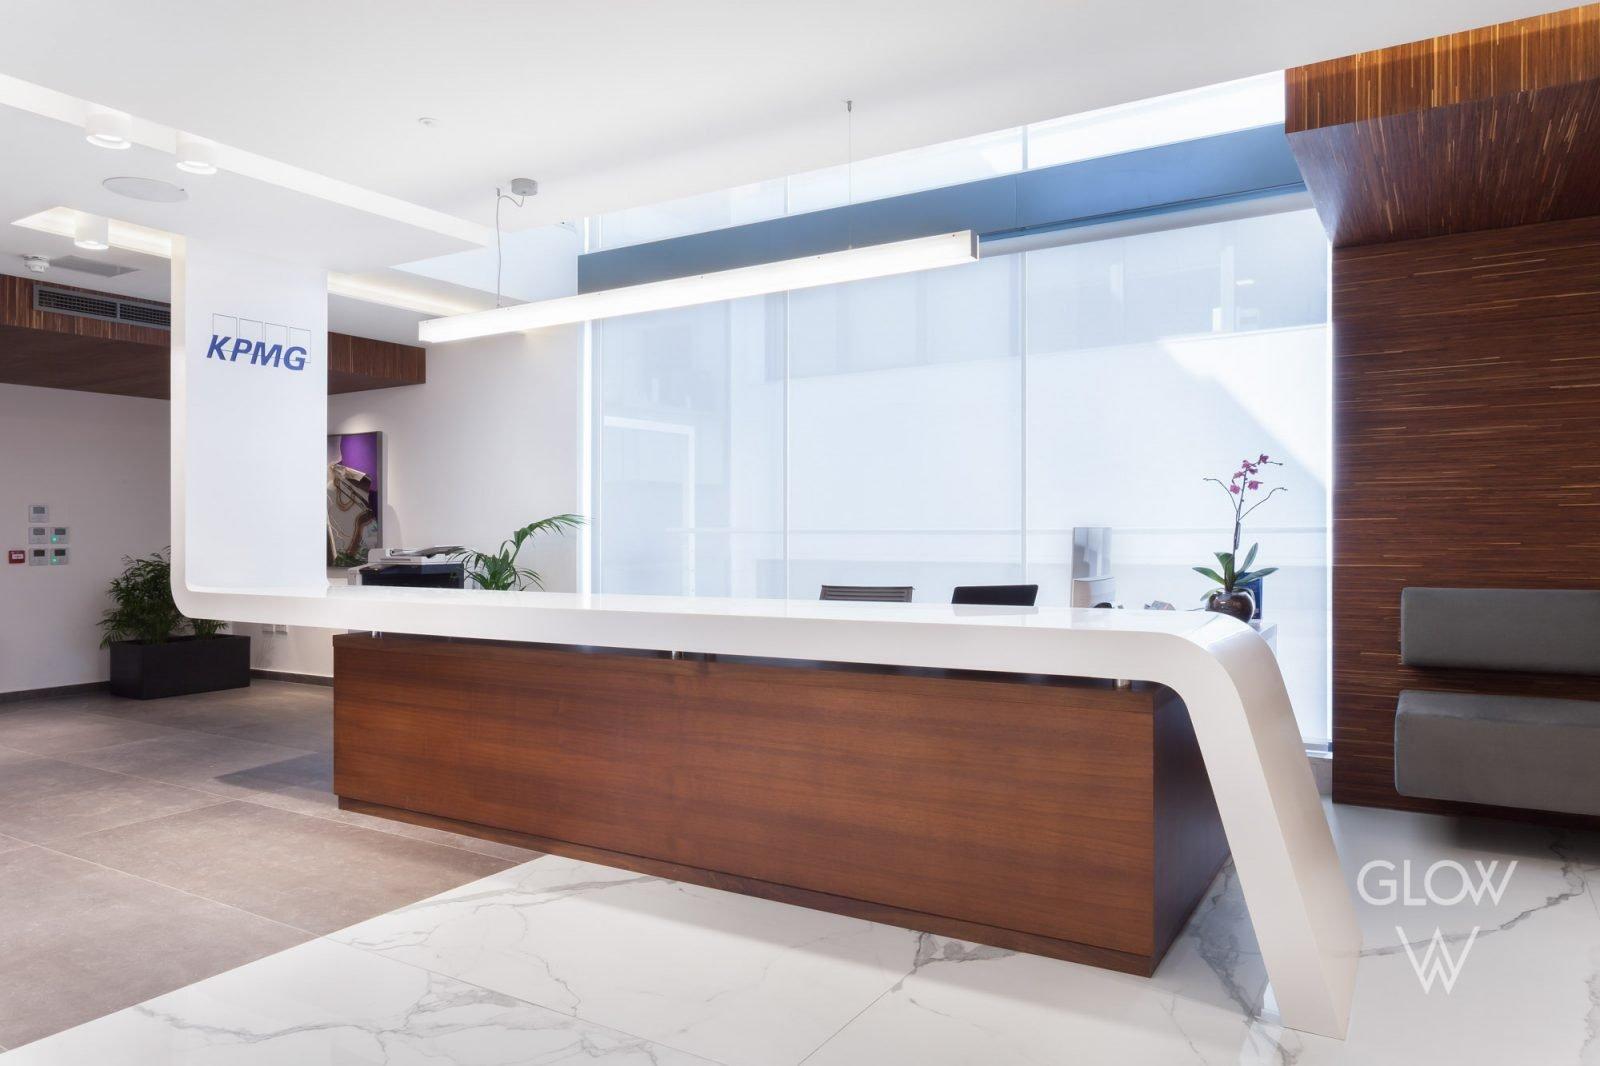 KPMG Offices-2